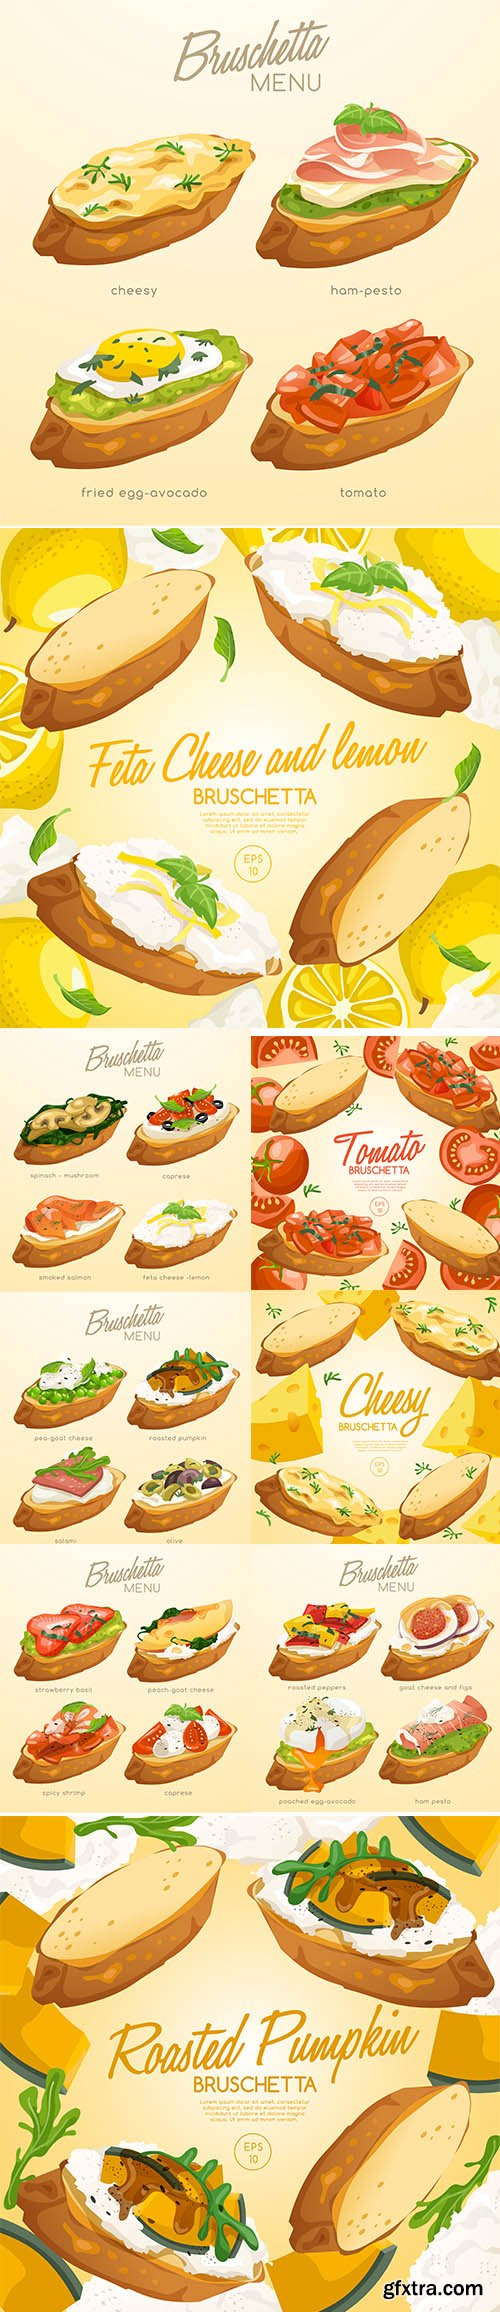 Set of Bruschetta Delicious Italian Appetizer